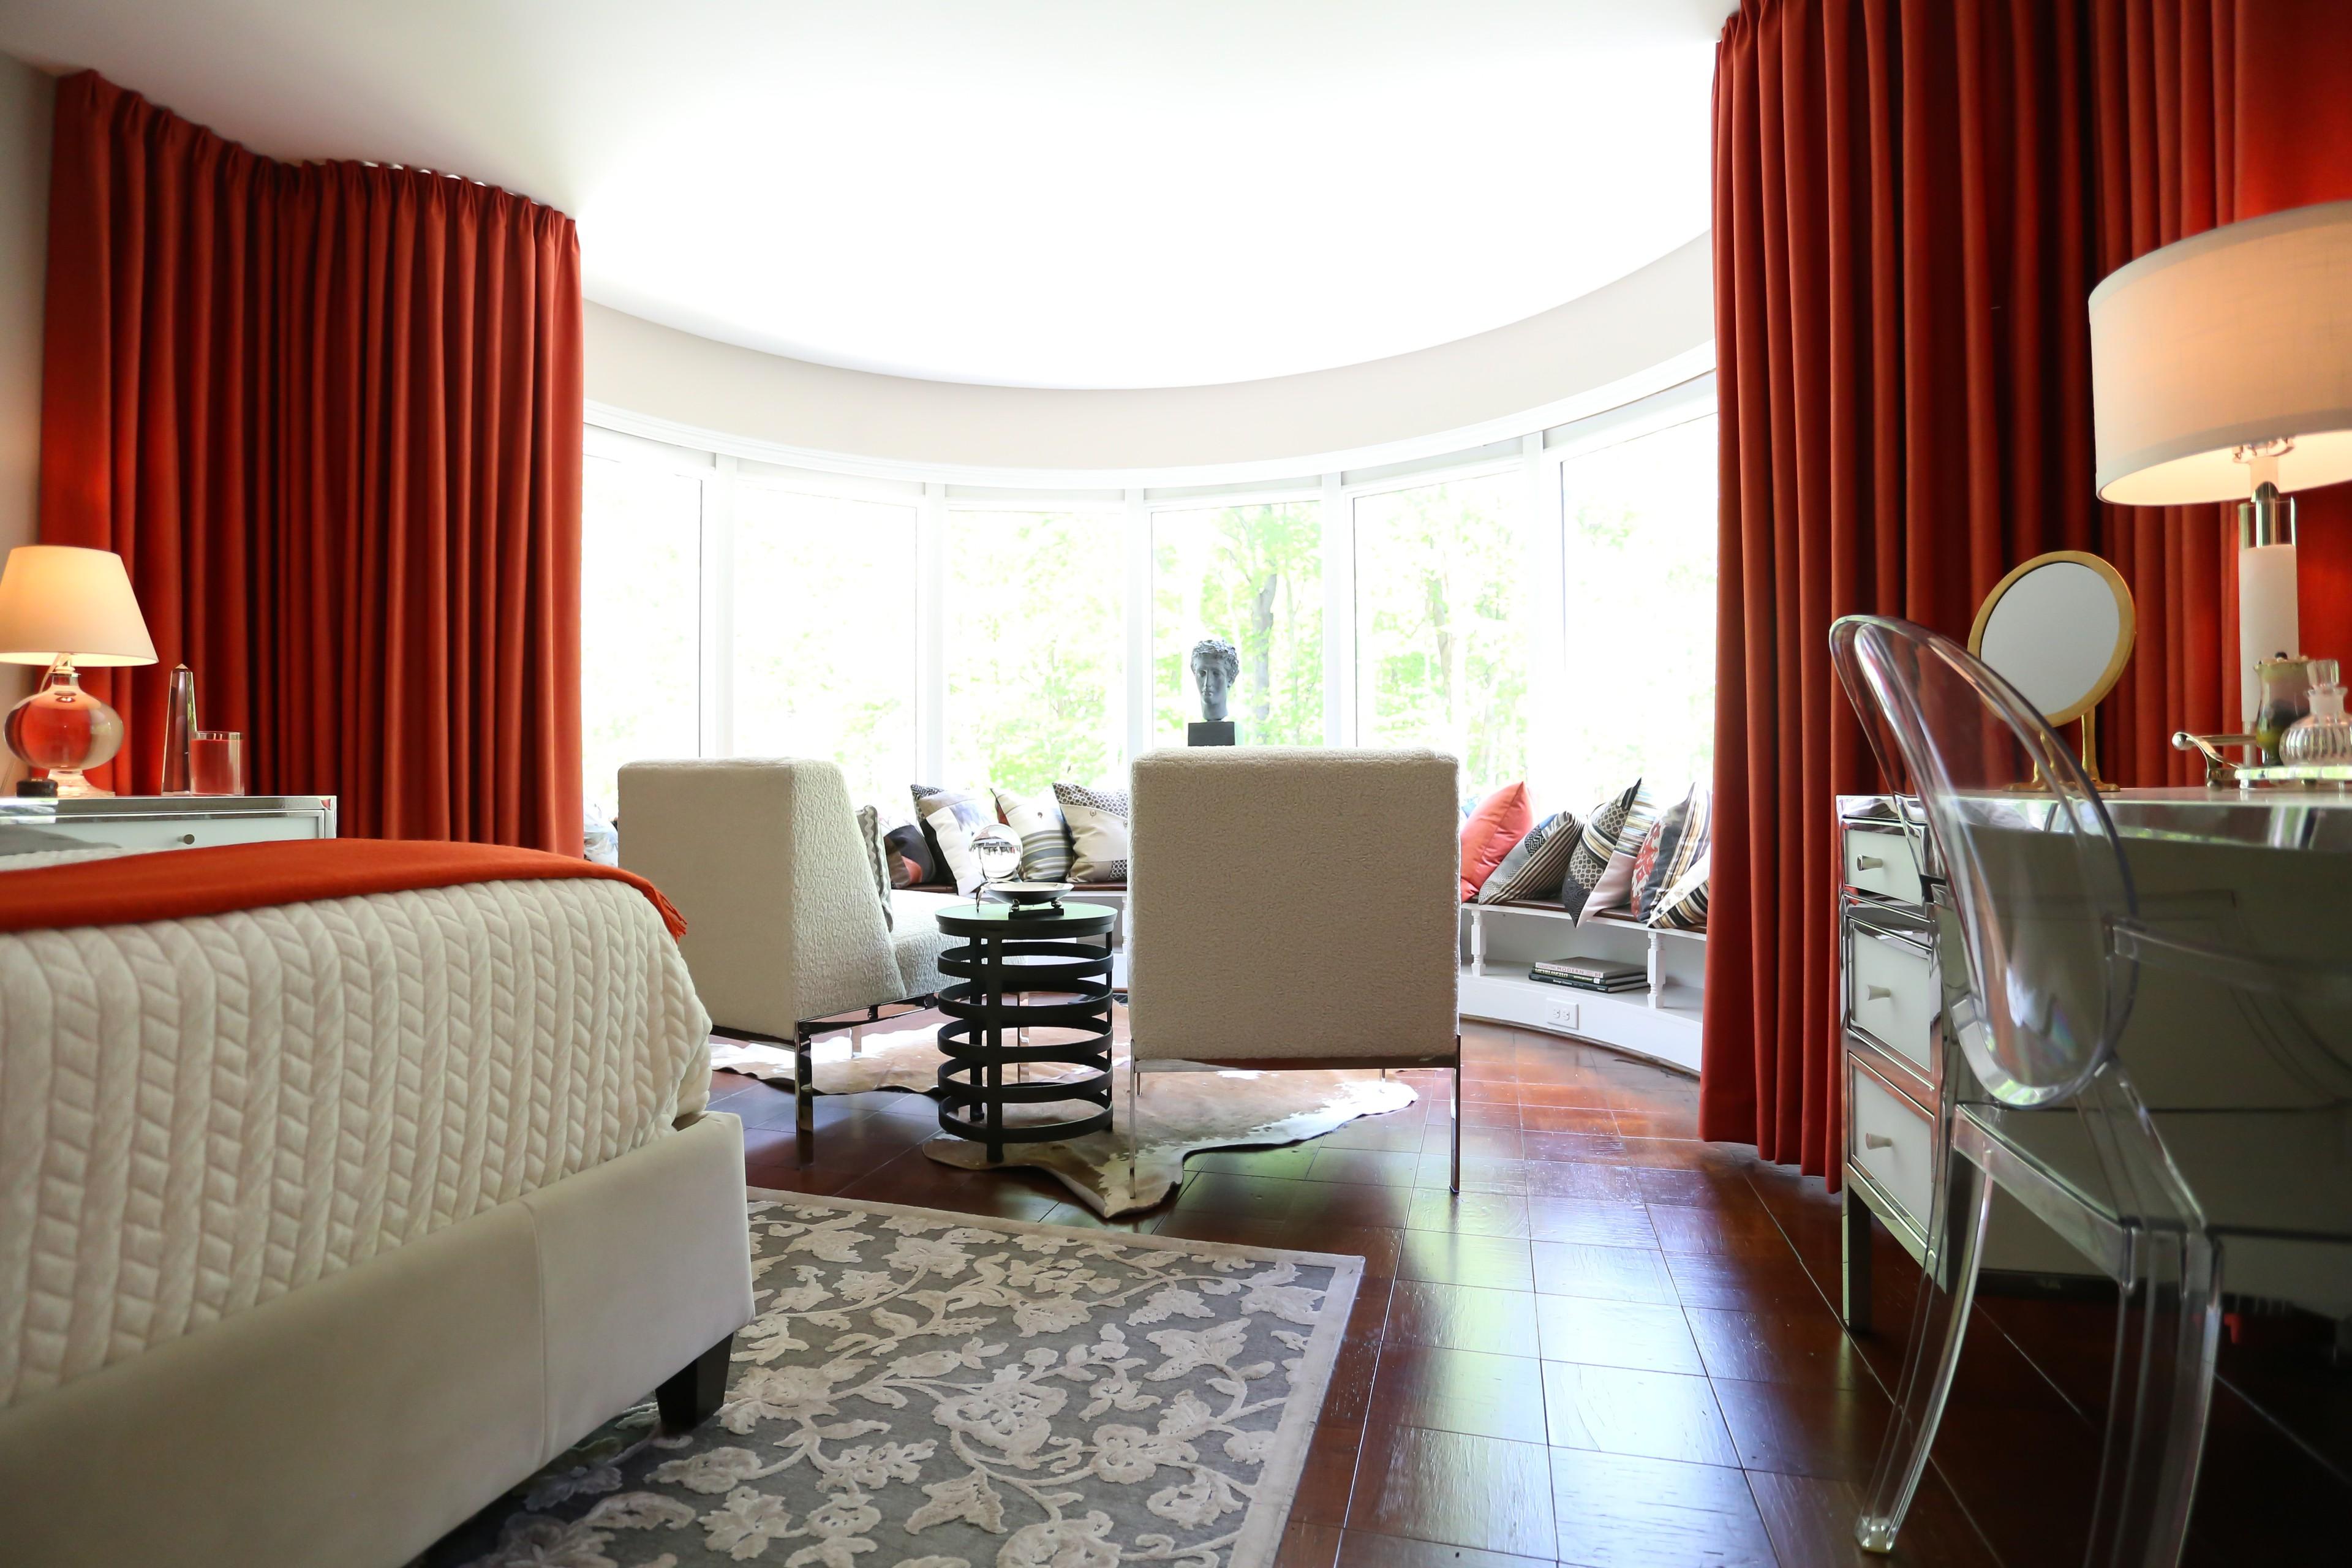 Decorators' Show House 2015 - Bedroom